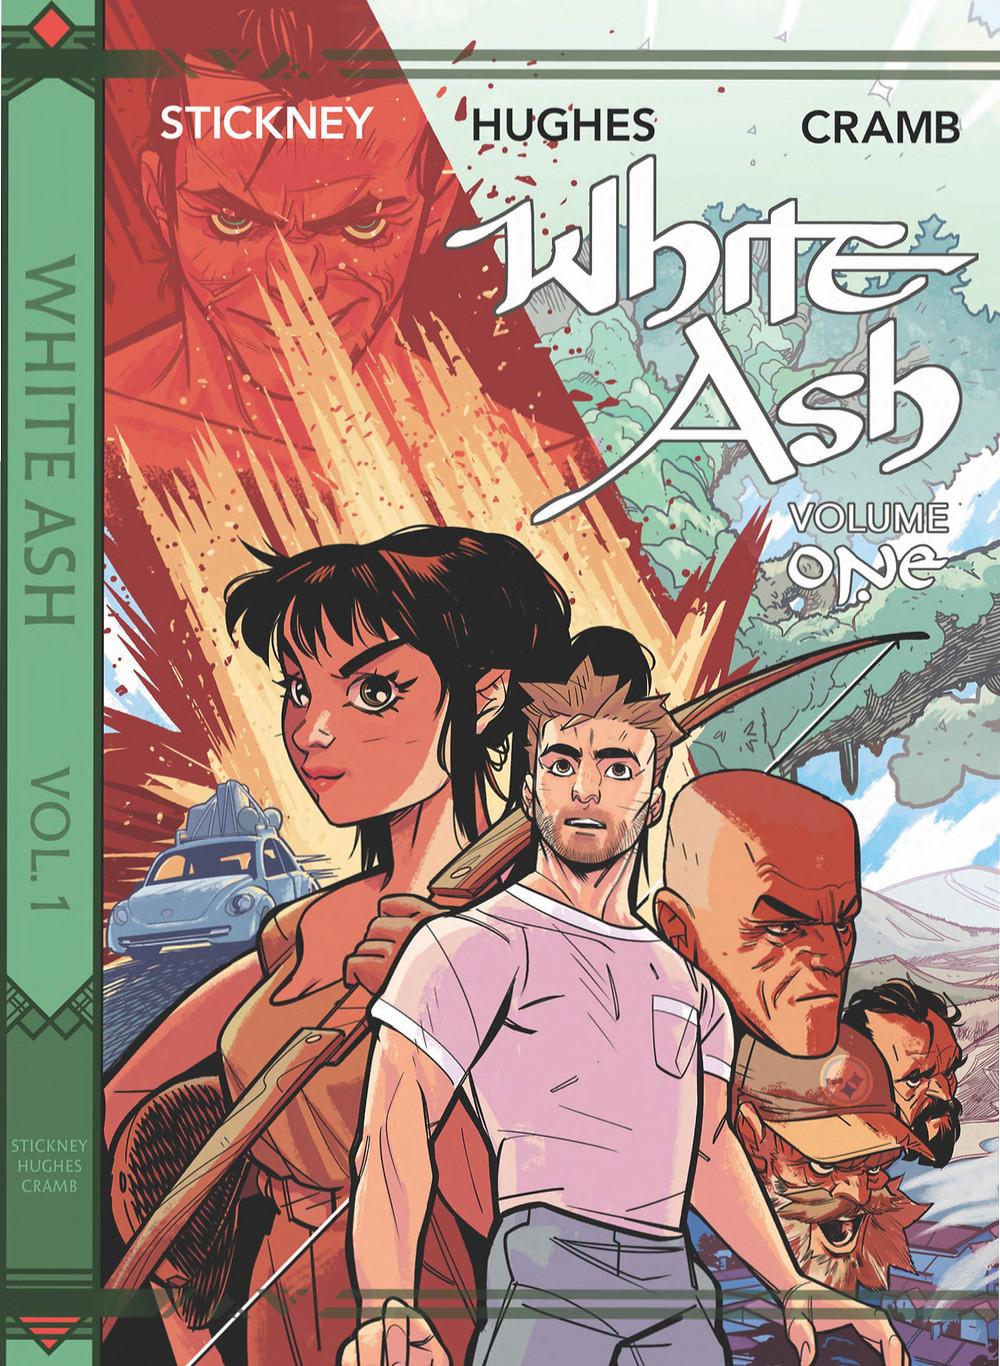 White Ash, Vol. 1, cover, Scout Comics, Stickney/Hughes